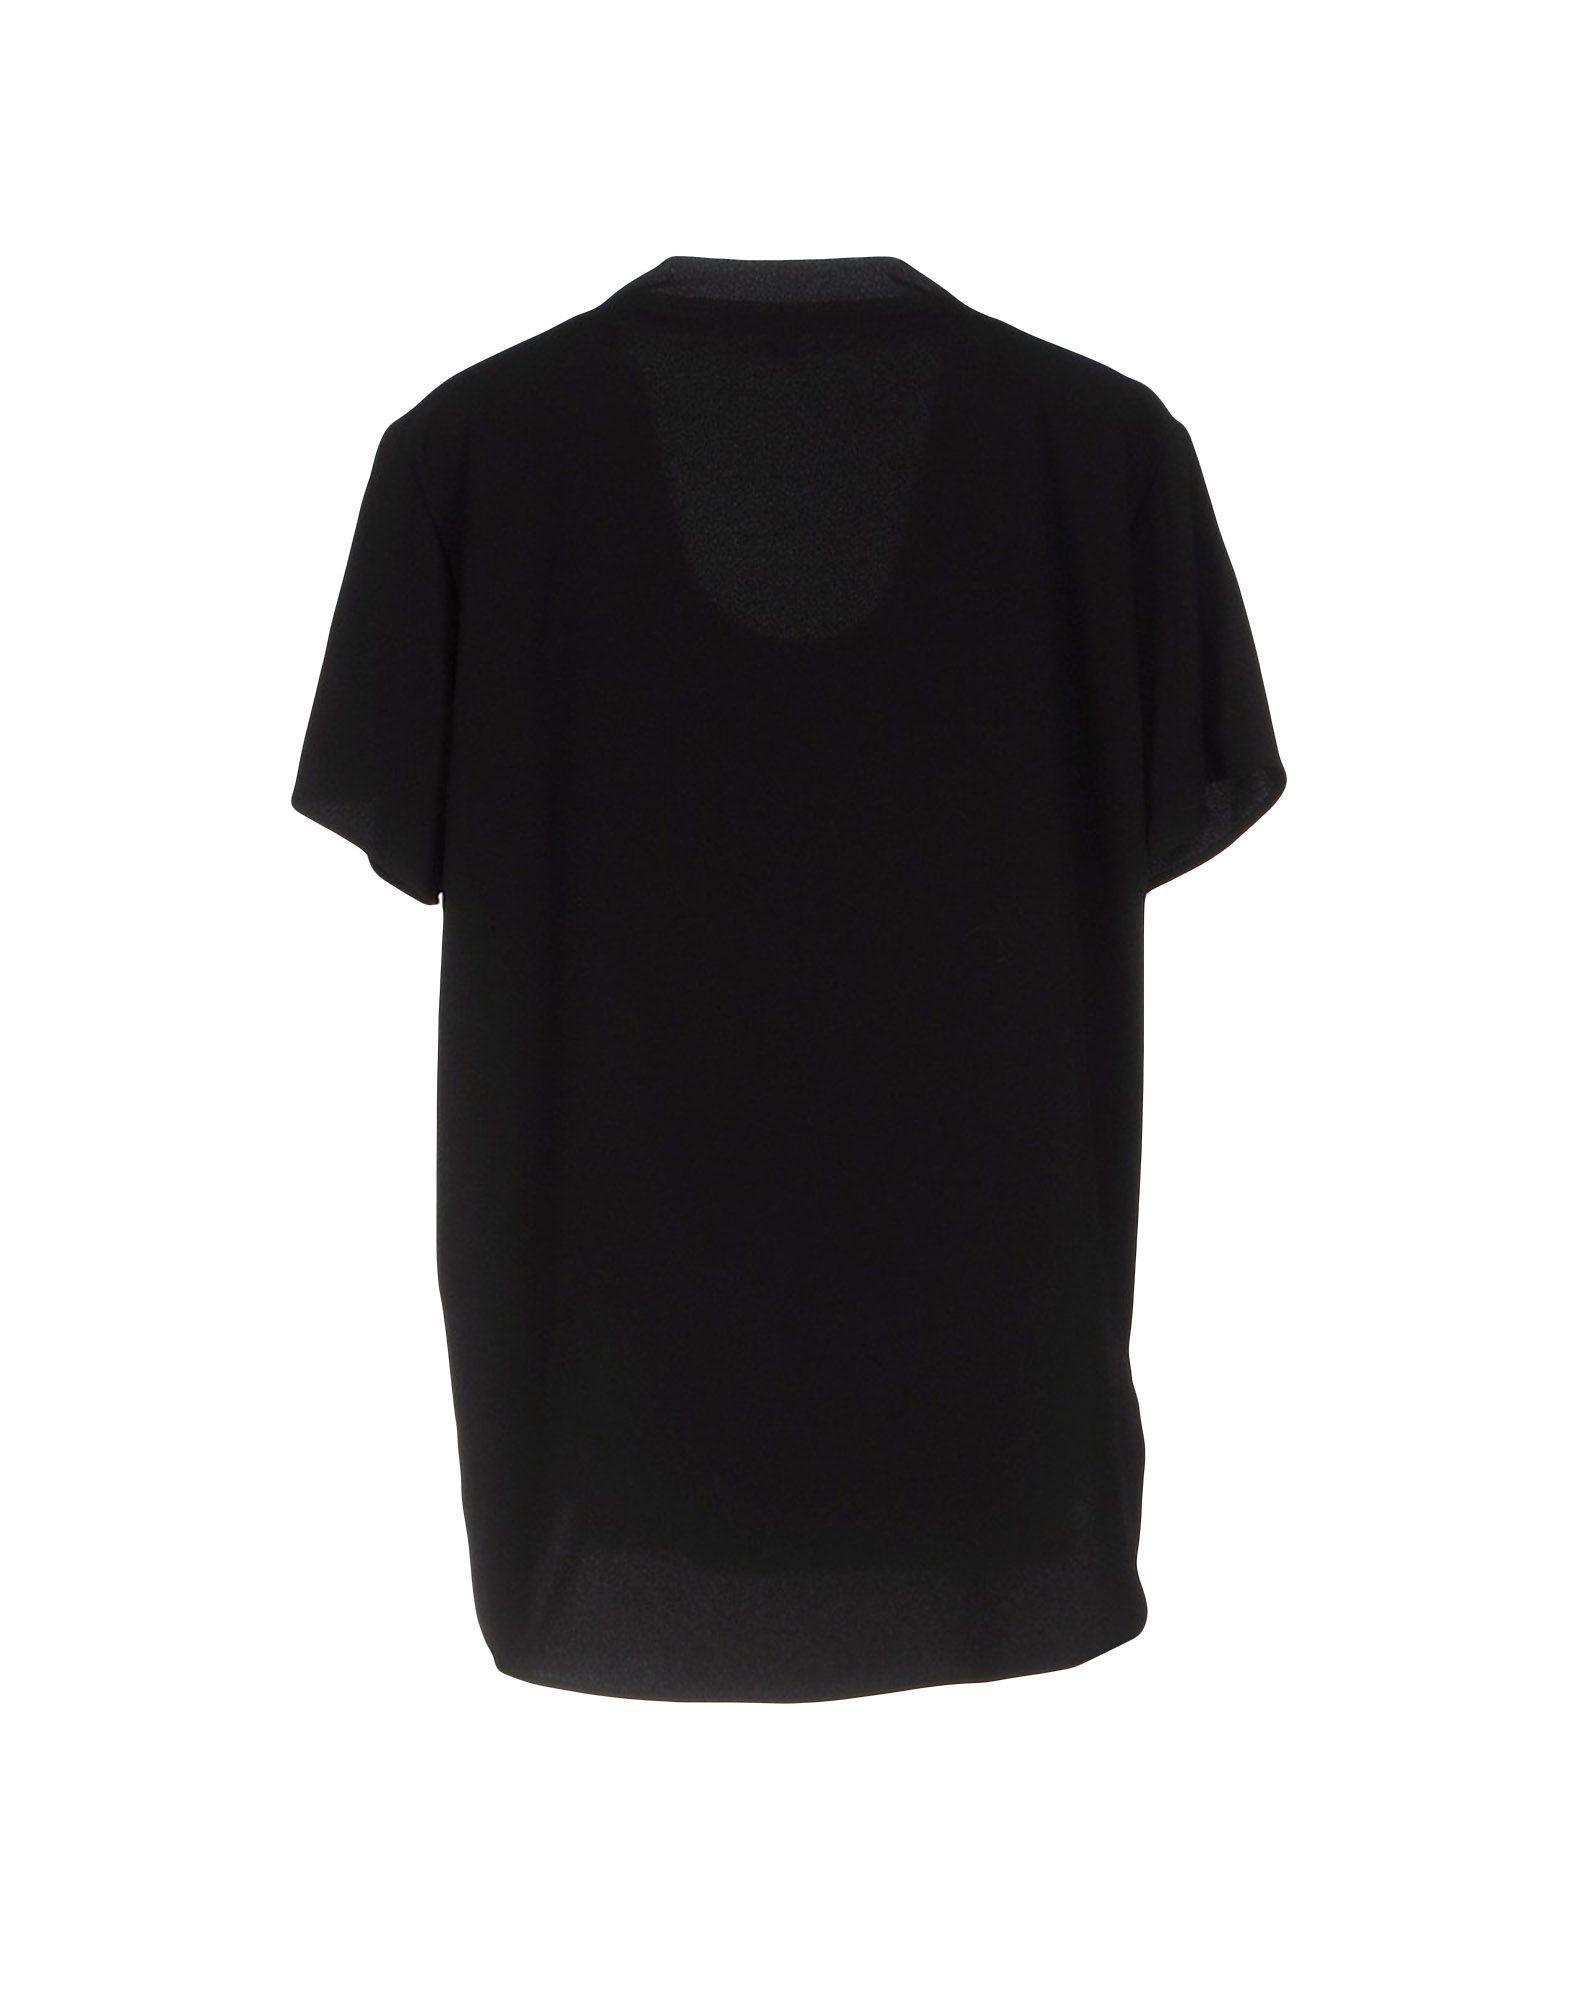 Shirts Michael Michael Kors Black Women's Polyester